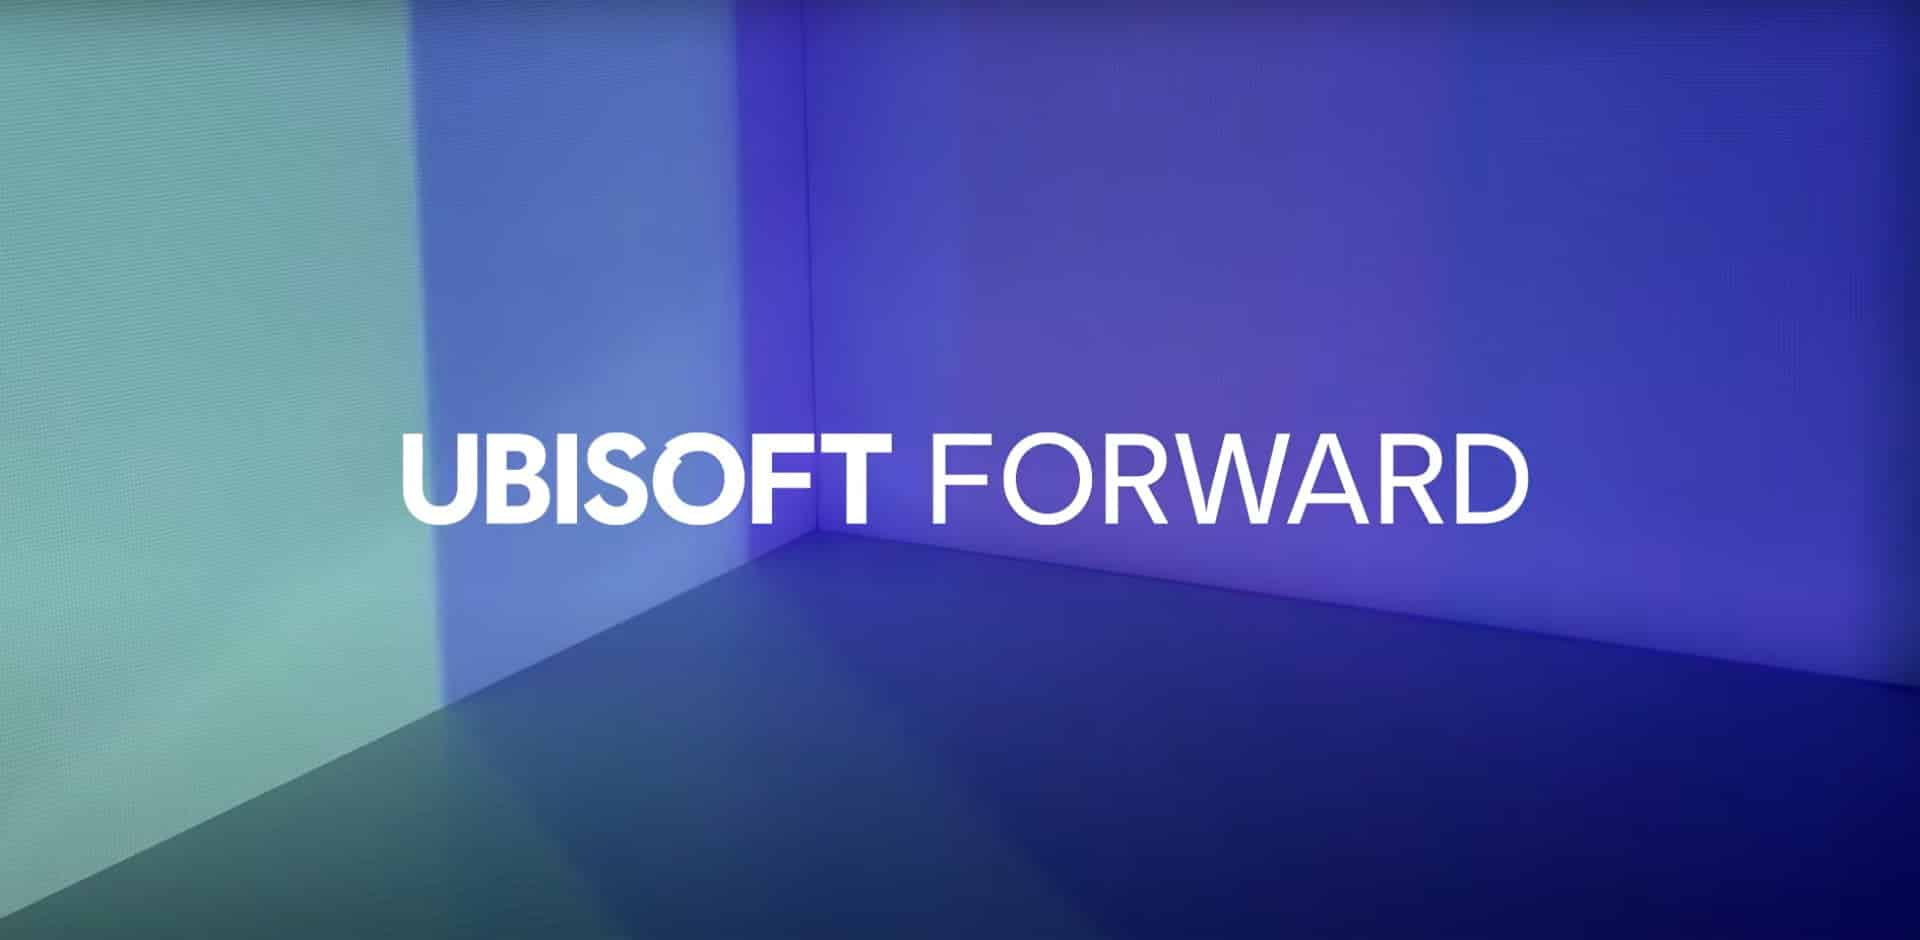 Ubisoft Forward Far Cry 6 E3 2021, Riders Republic,